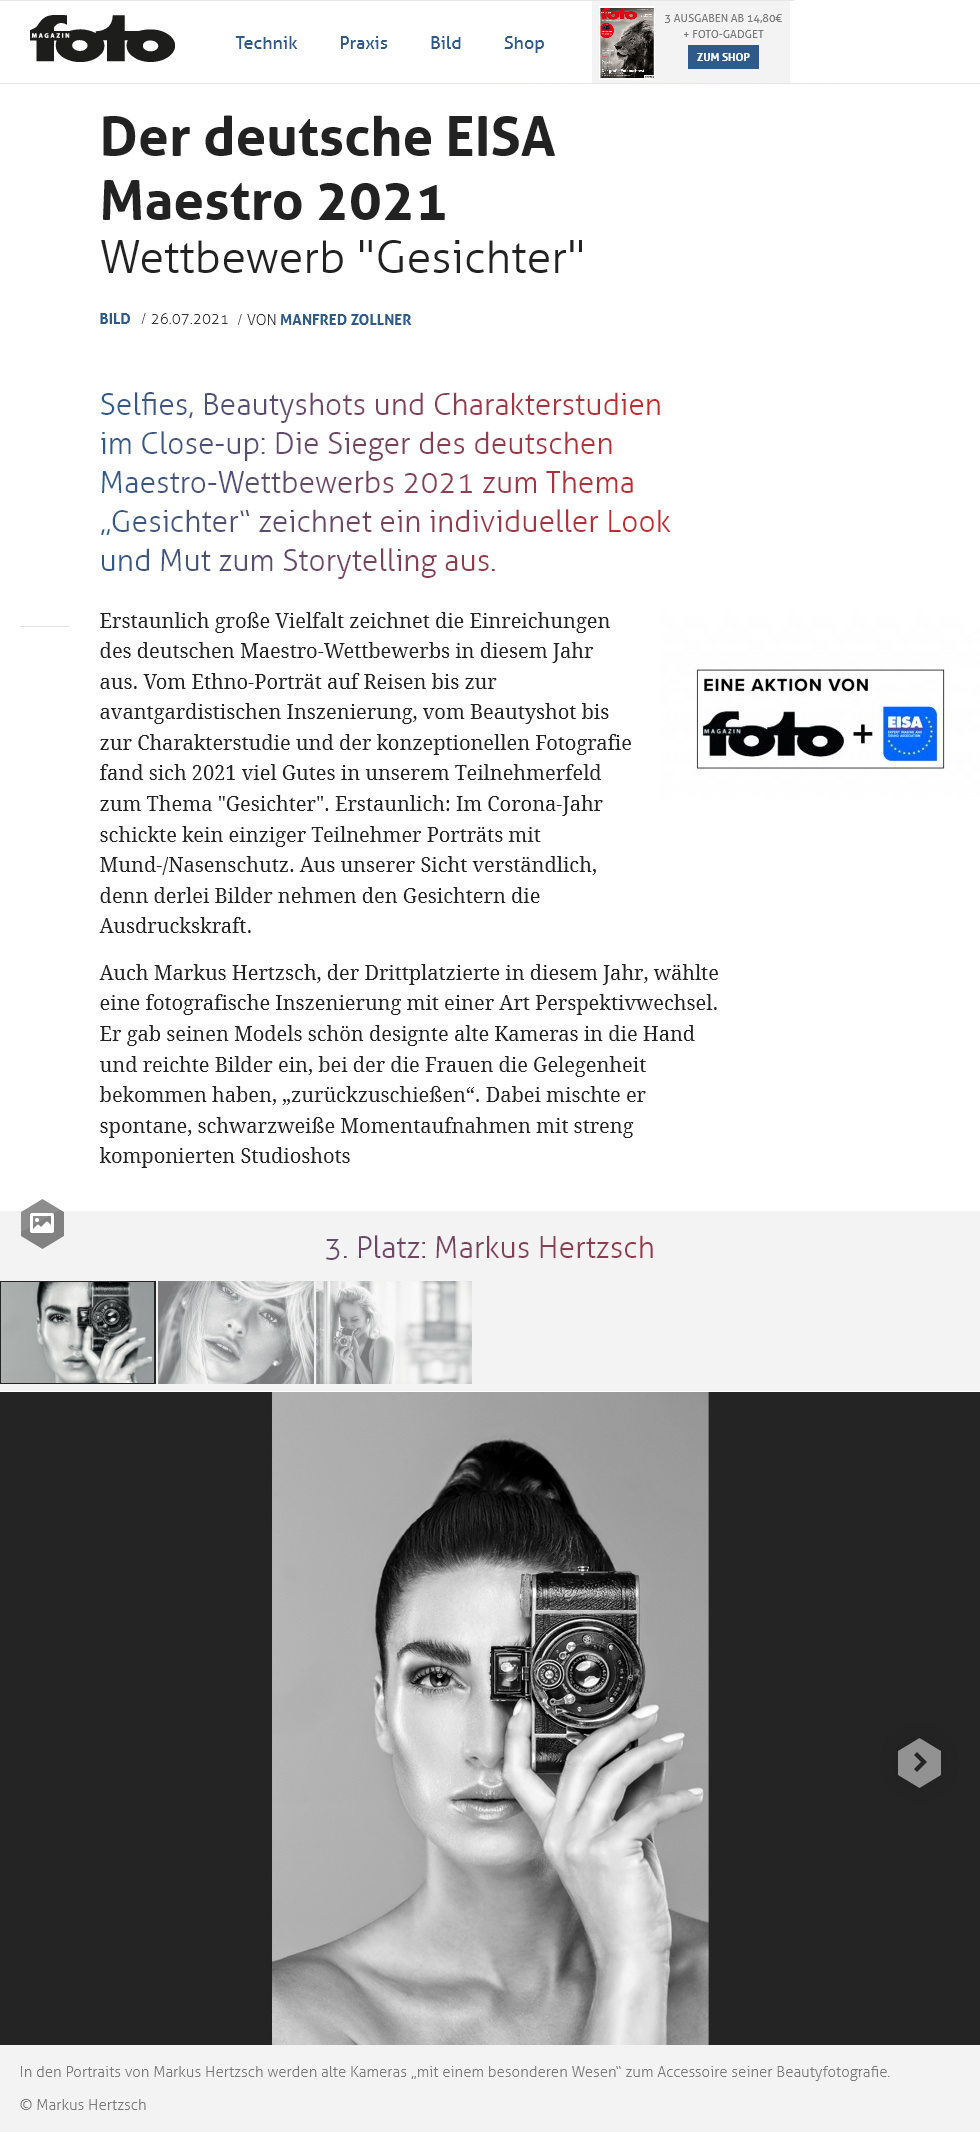 Fotomagazin Online 08 2021 - Markus Hertzsch - Girl - Model - Camera - Bokeh -  Portrait - Eisa Award - Ihagee Parvola